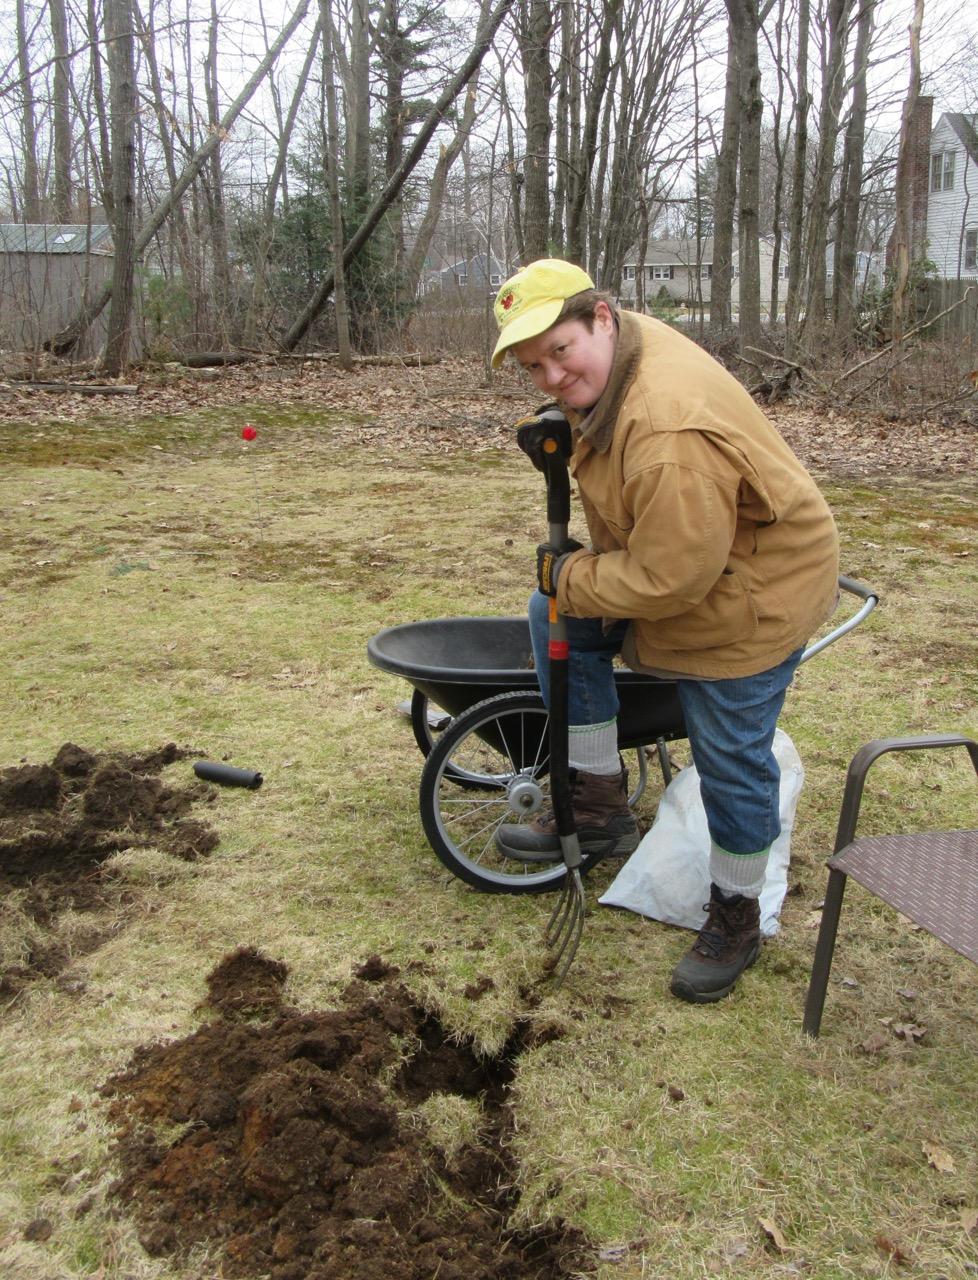 Margy digging